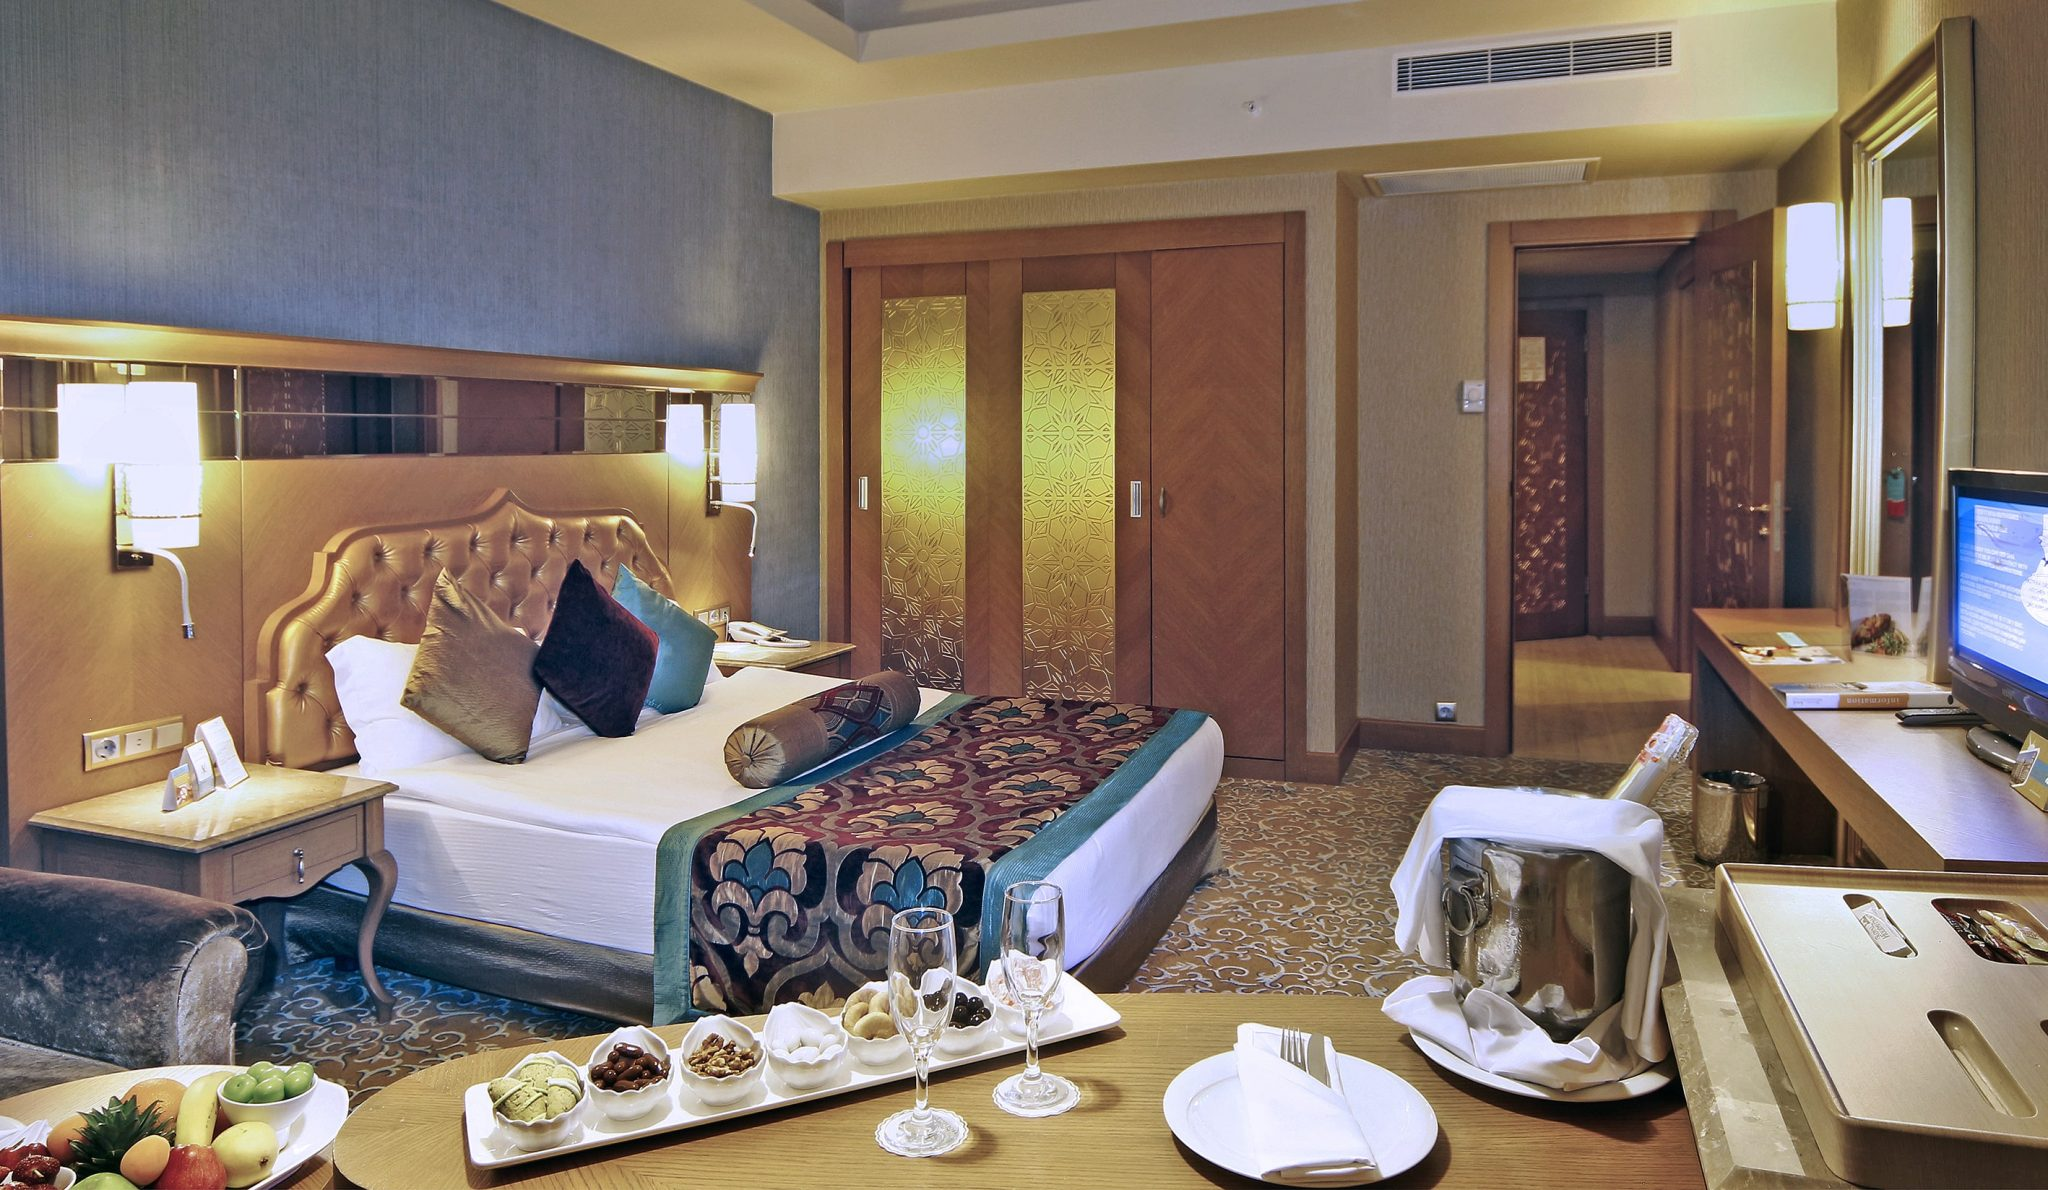 Letovanje_Turska_Hoteli_Avio_Antalija_Hotel_Royal_Holiday_Palace-20-scaled.jpg